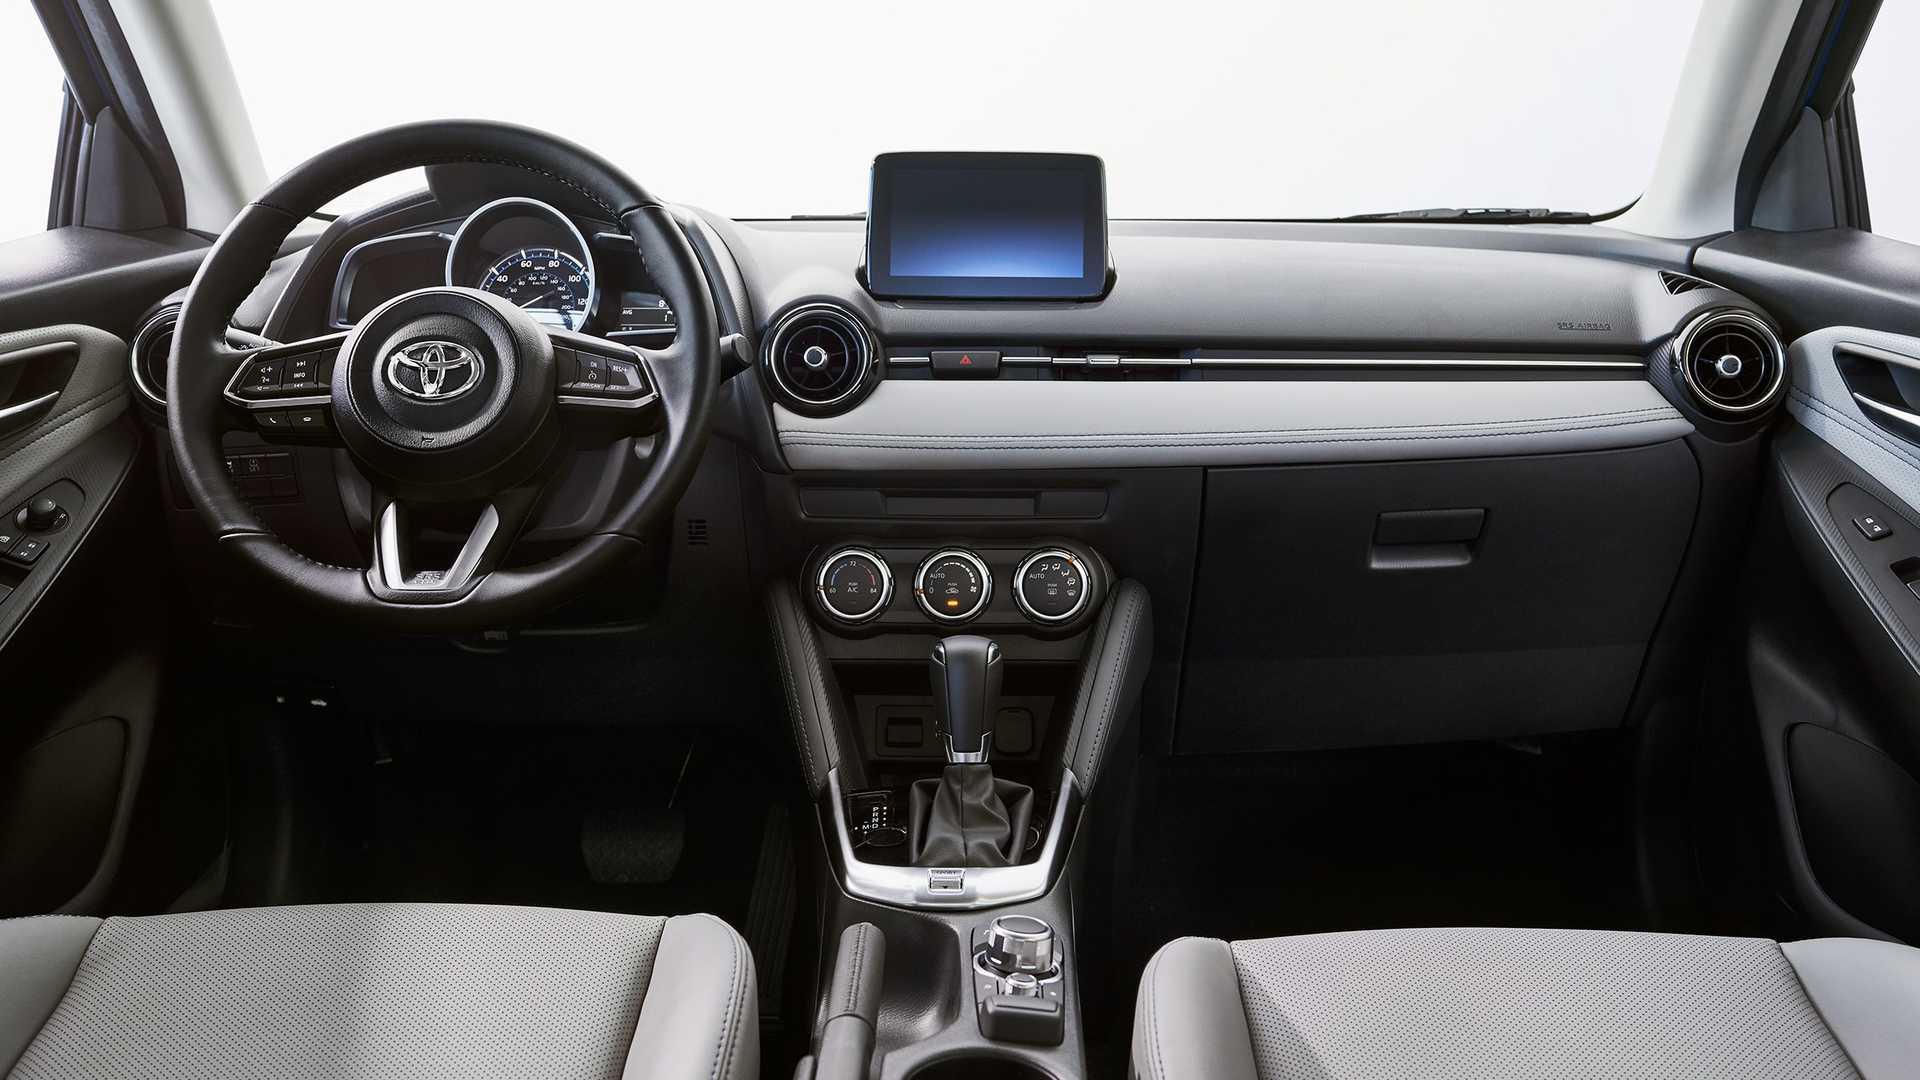 2020-toyota-yaris-hatchback-7.jpg